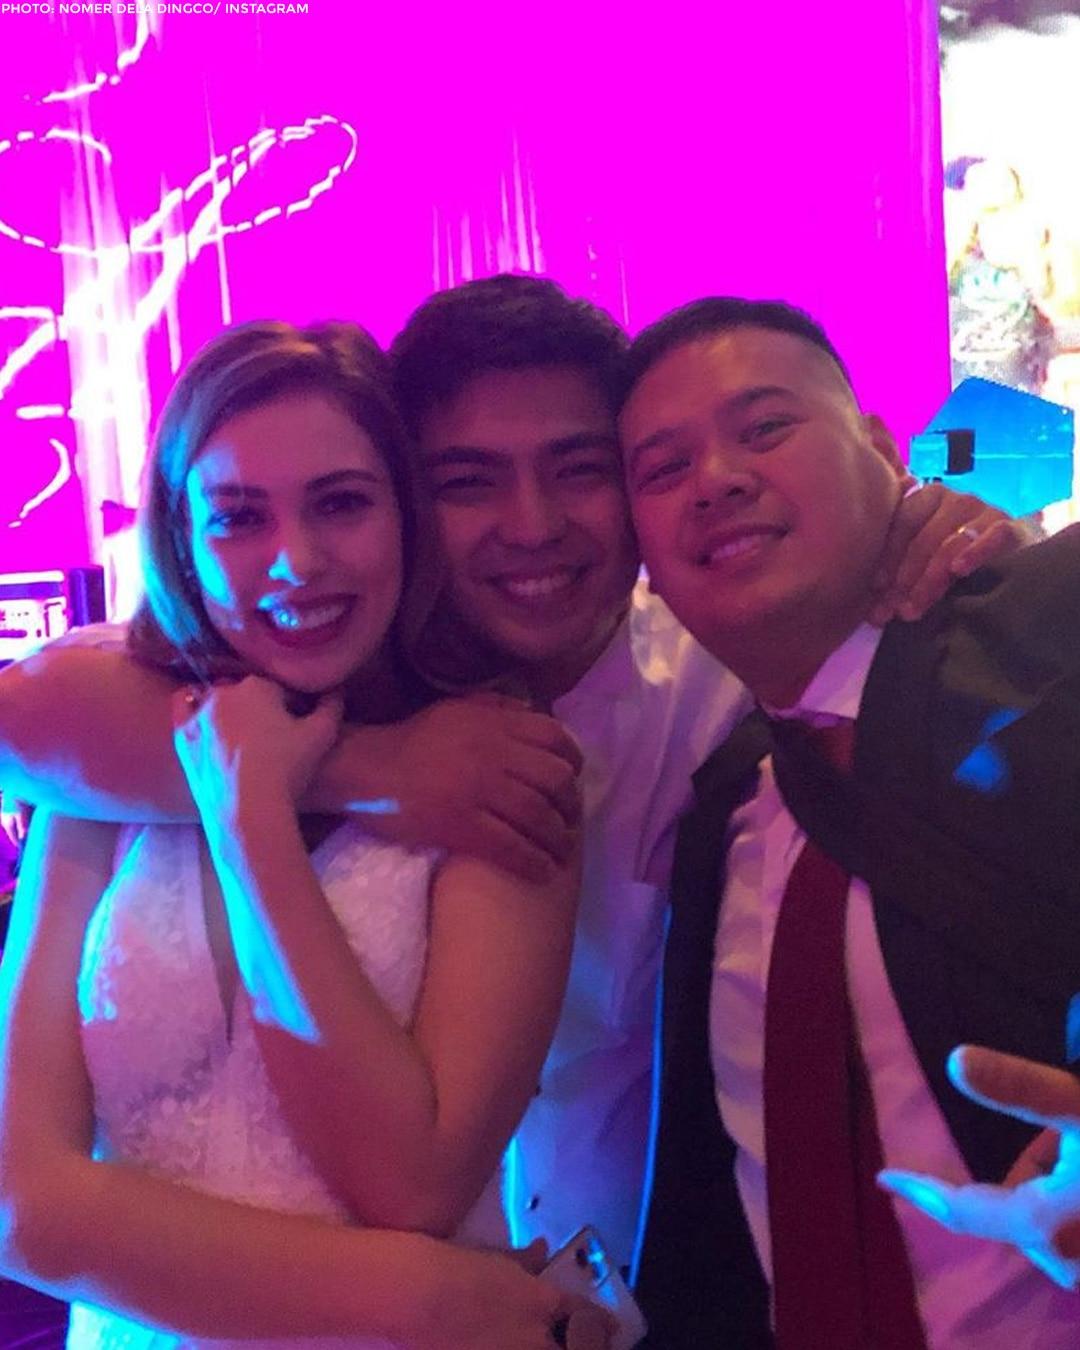 Jolo Revilla and Angelica Alita's beautiful wedding photos